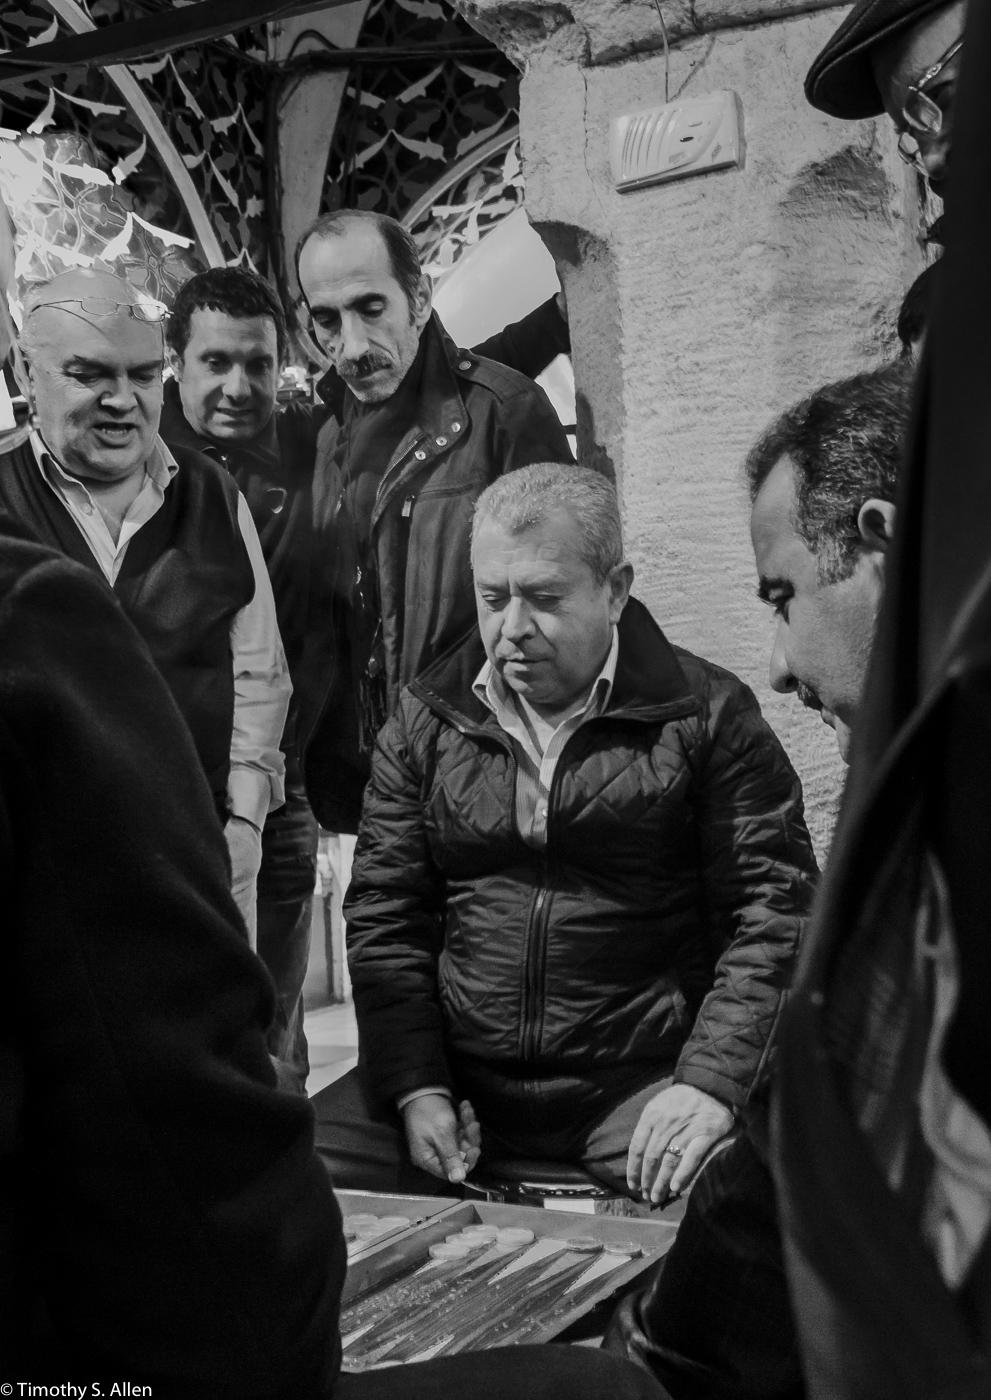 Intense Backgammon Game in the Istanbul Bazaar. Lots of Kibitzing Going On. Istanbul, Turkey - December 15, 2015